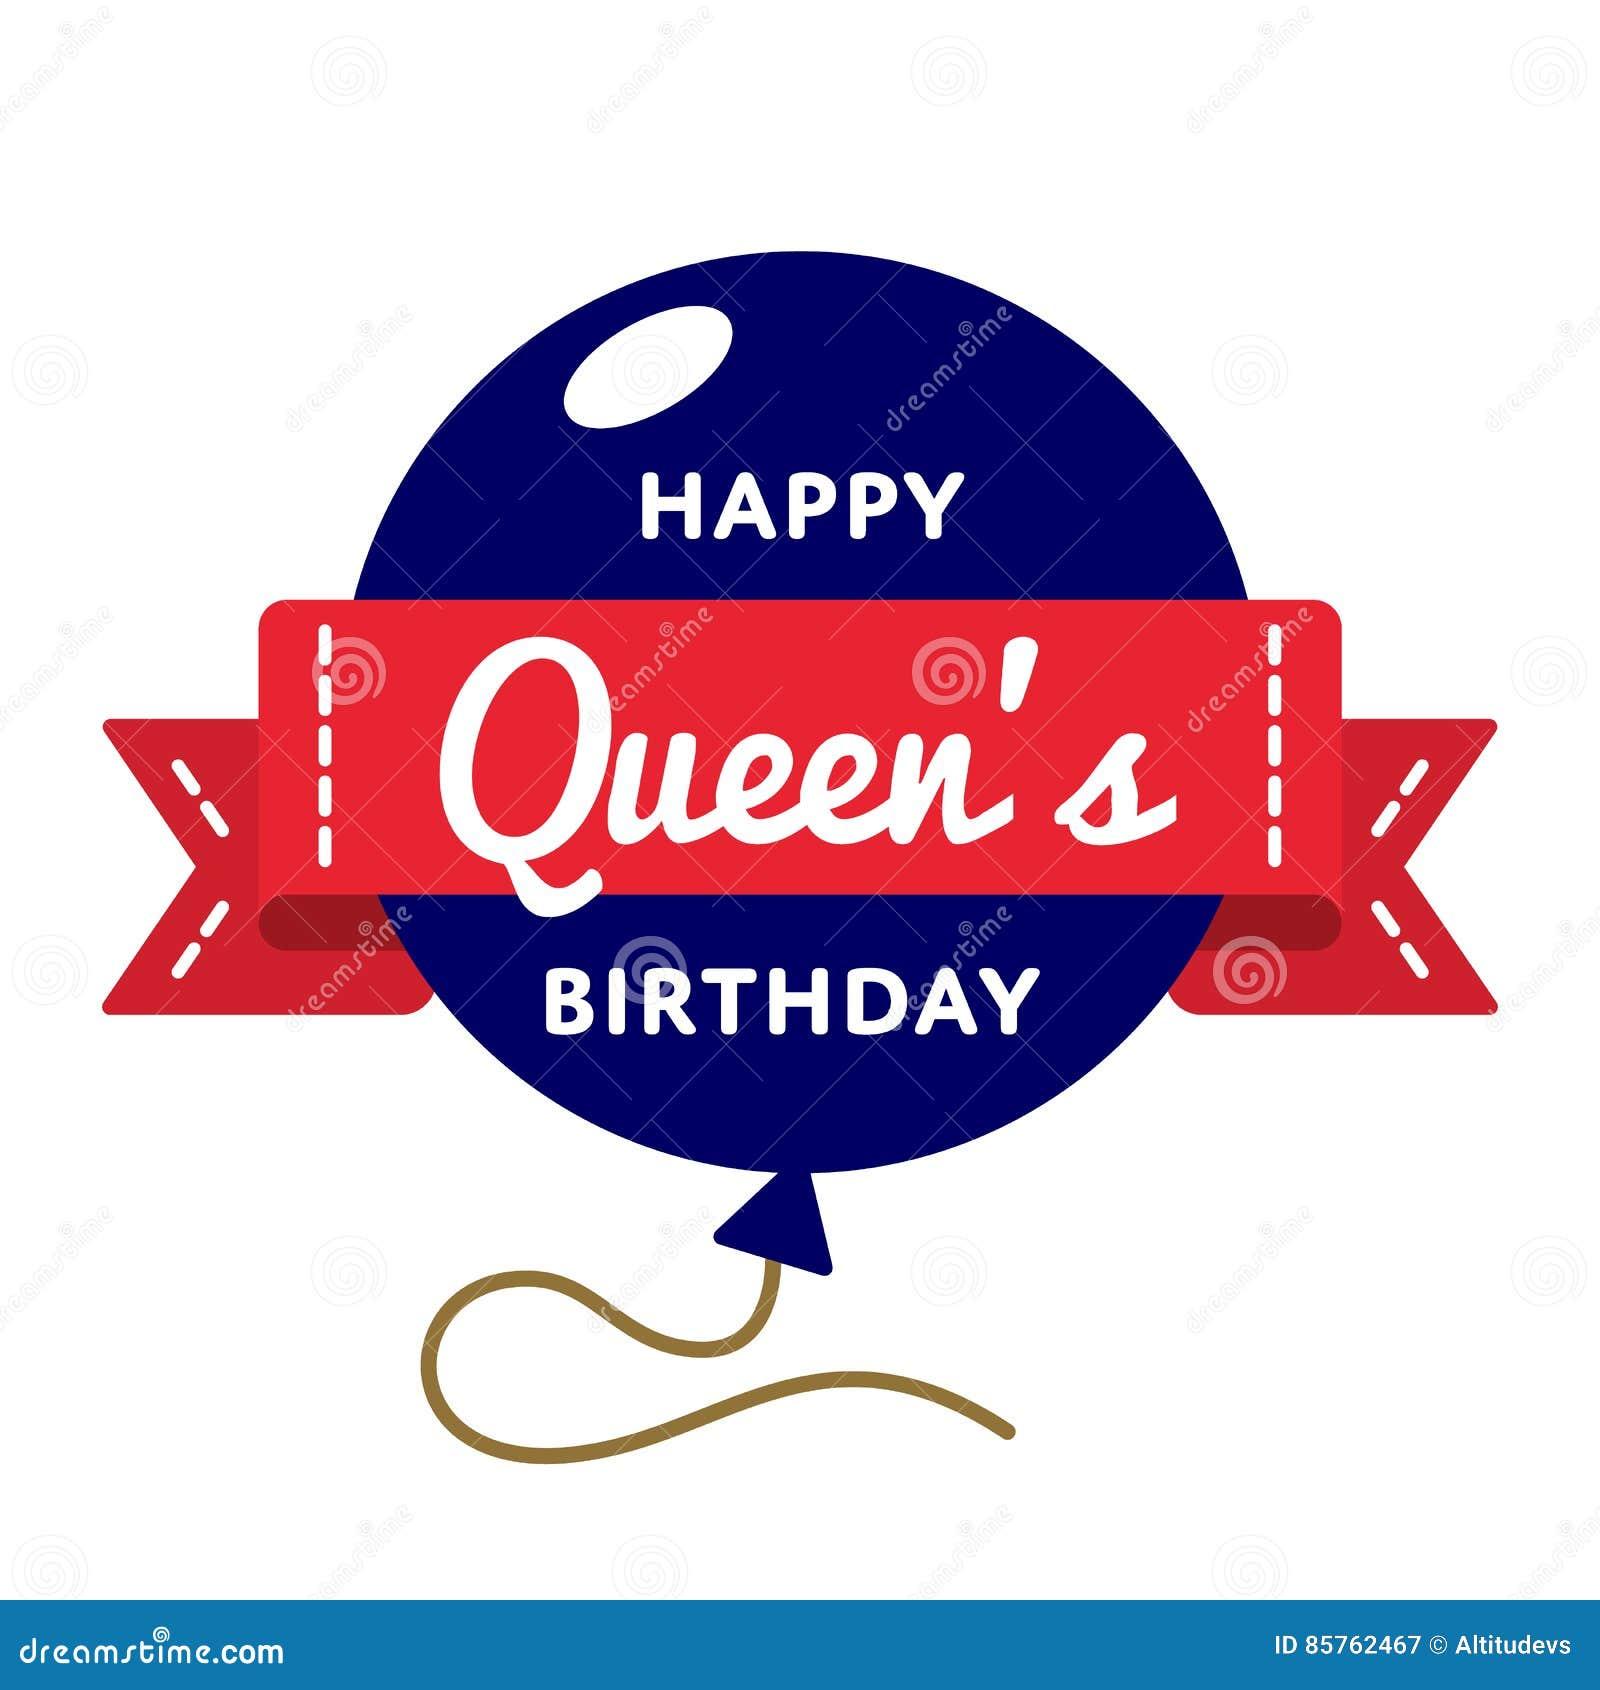 Happy queens birthday greeting emblem stock vector illustration of happy queens birthday greeting emblem m4hsunfo